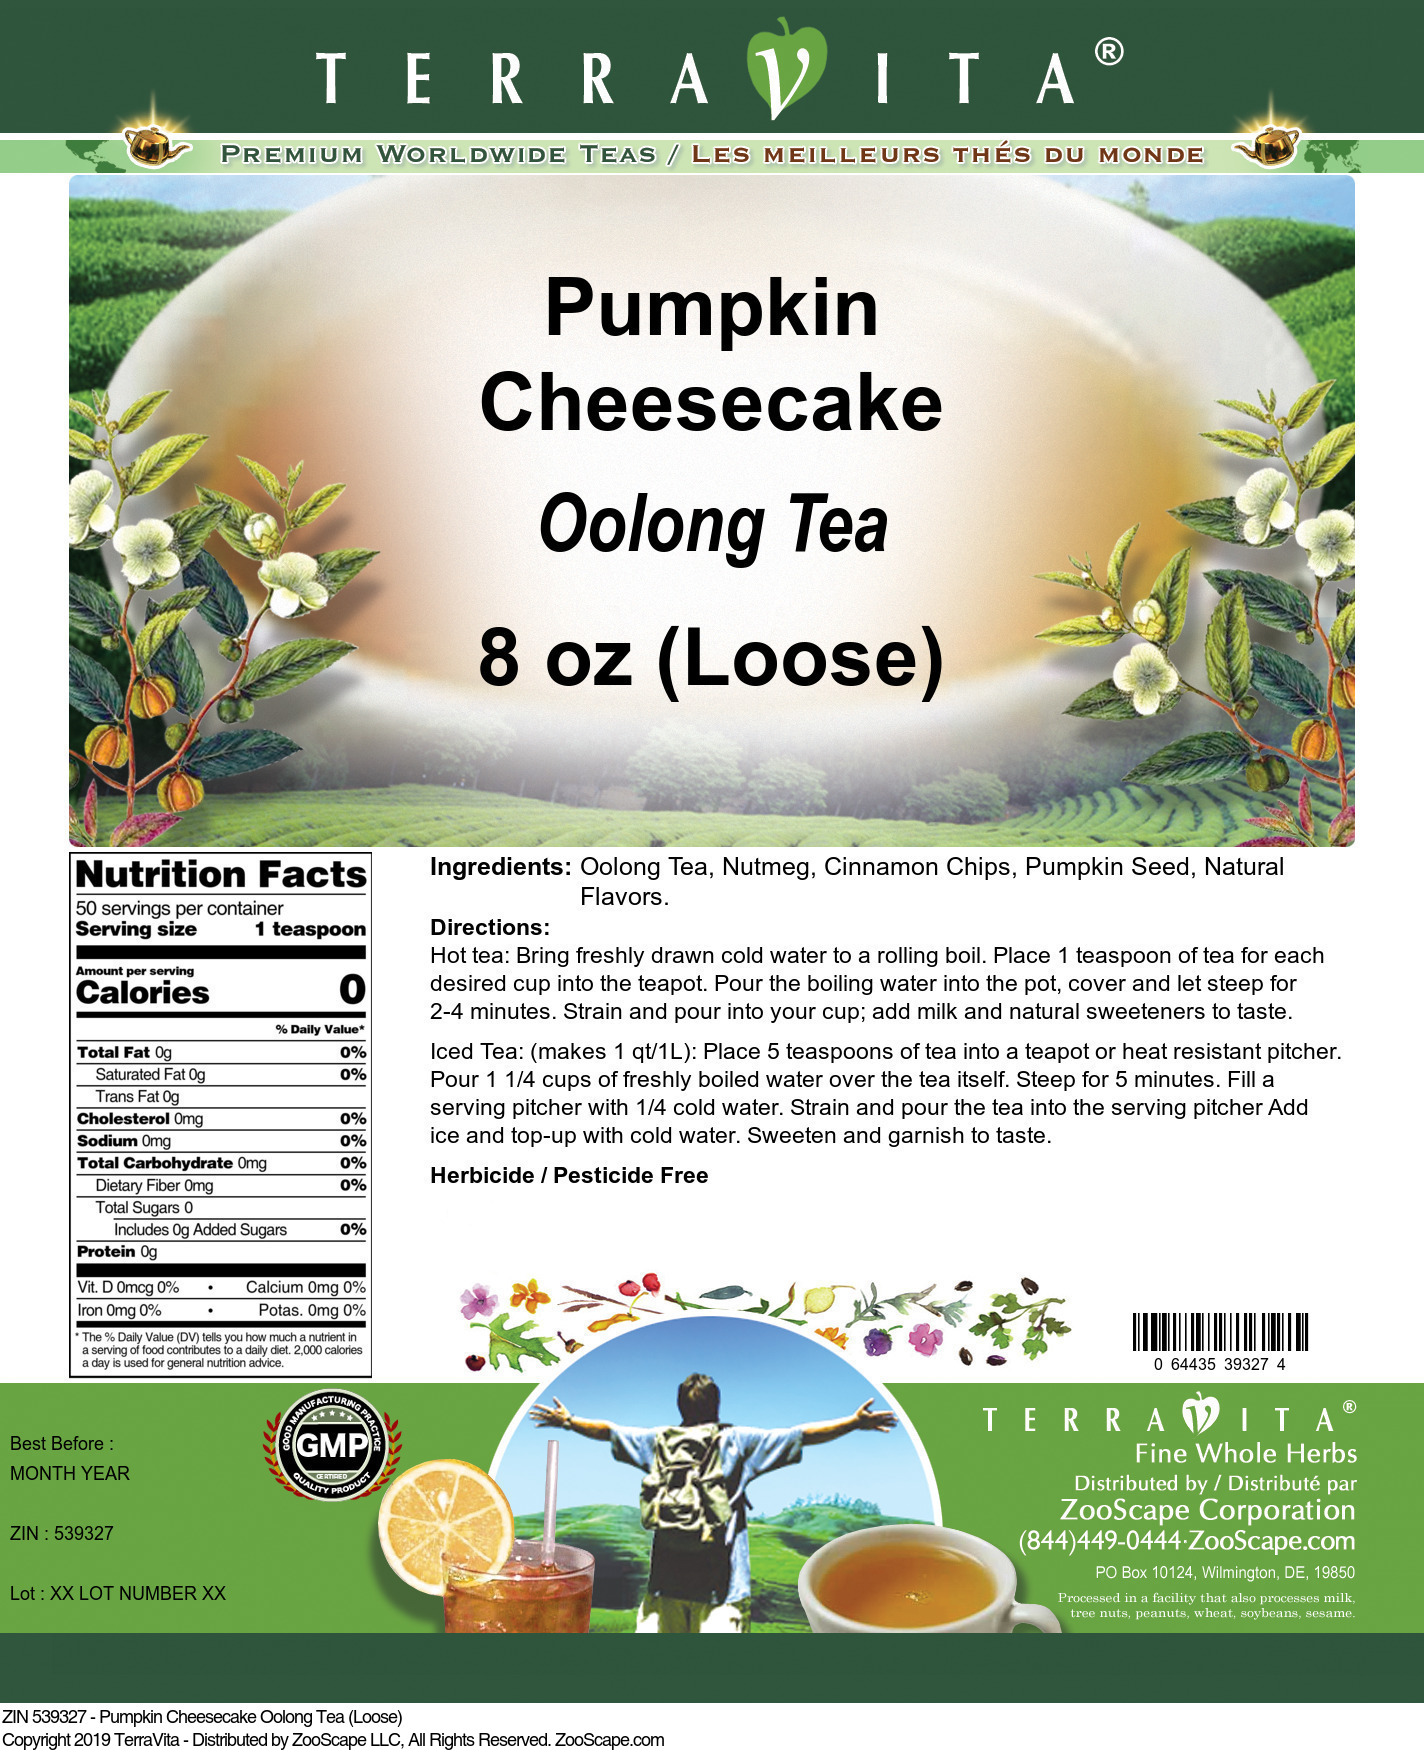 Pumpkin Cheesecake Oolong Tea (Loose)